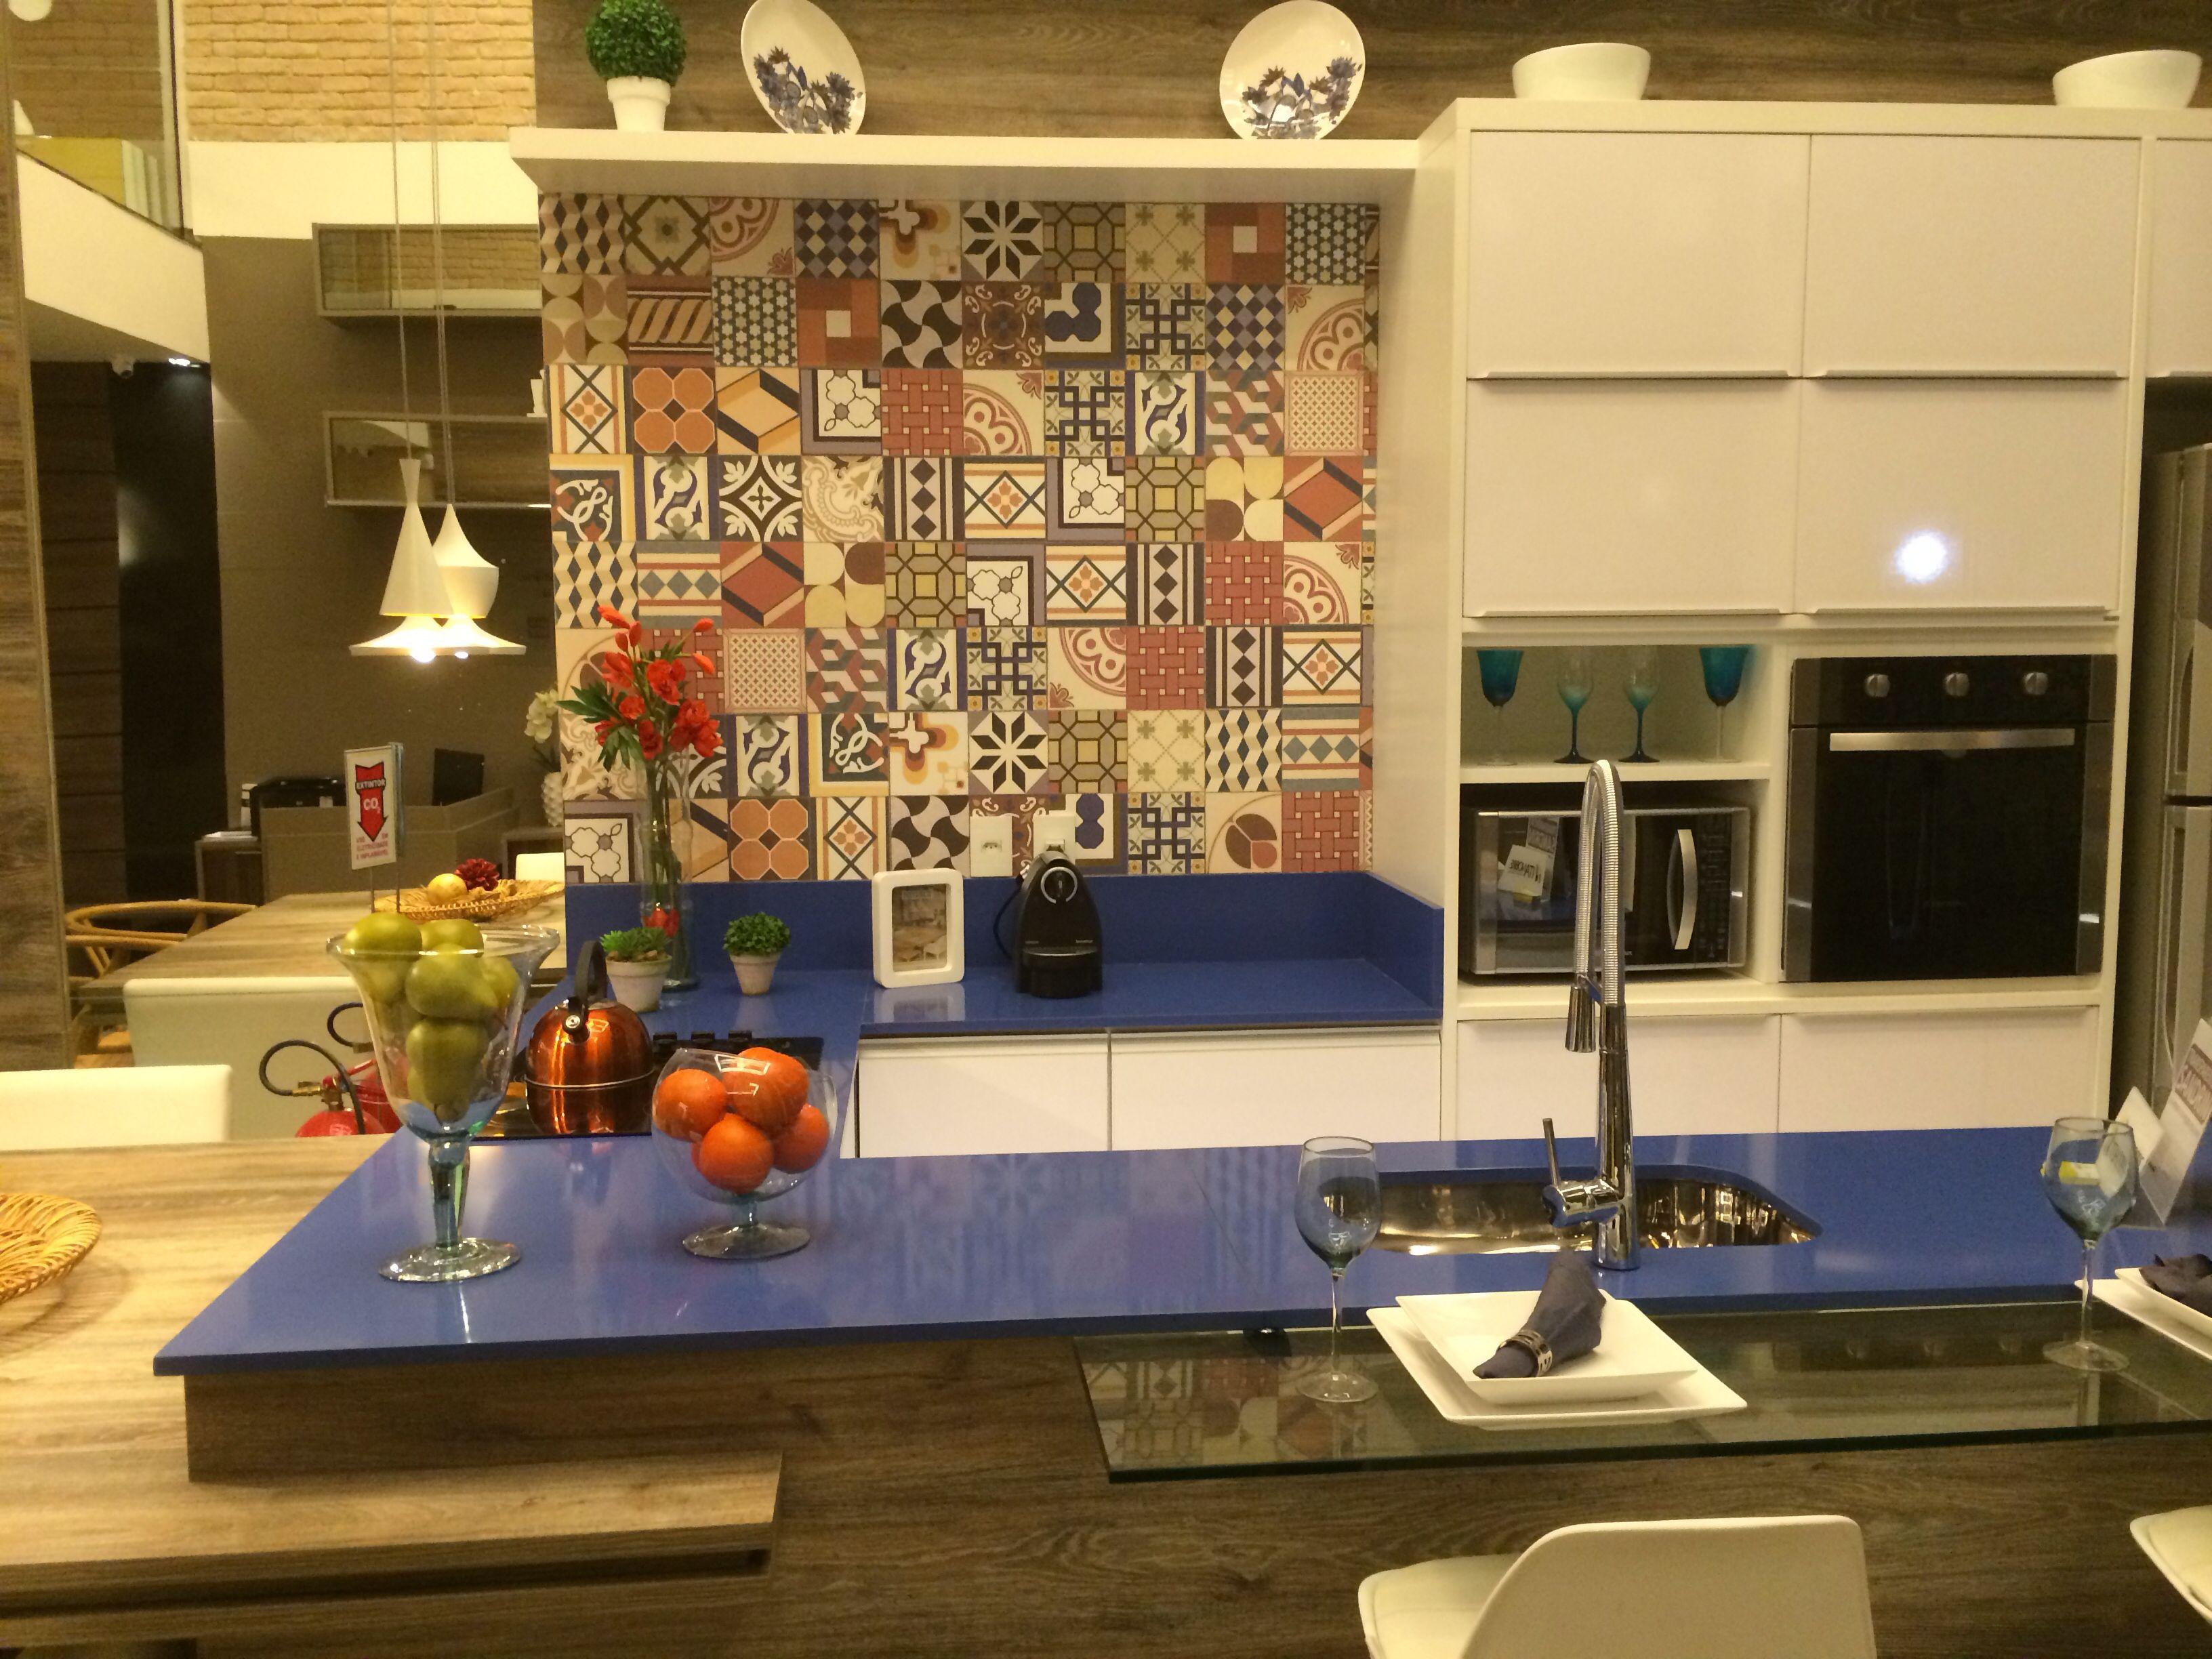 Cozinha com adesivo ladrilho hidr ulico my decoration - Ladrillo hidraulico ...